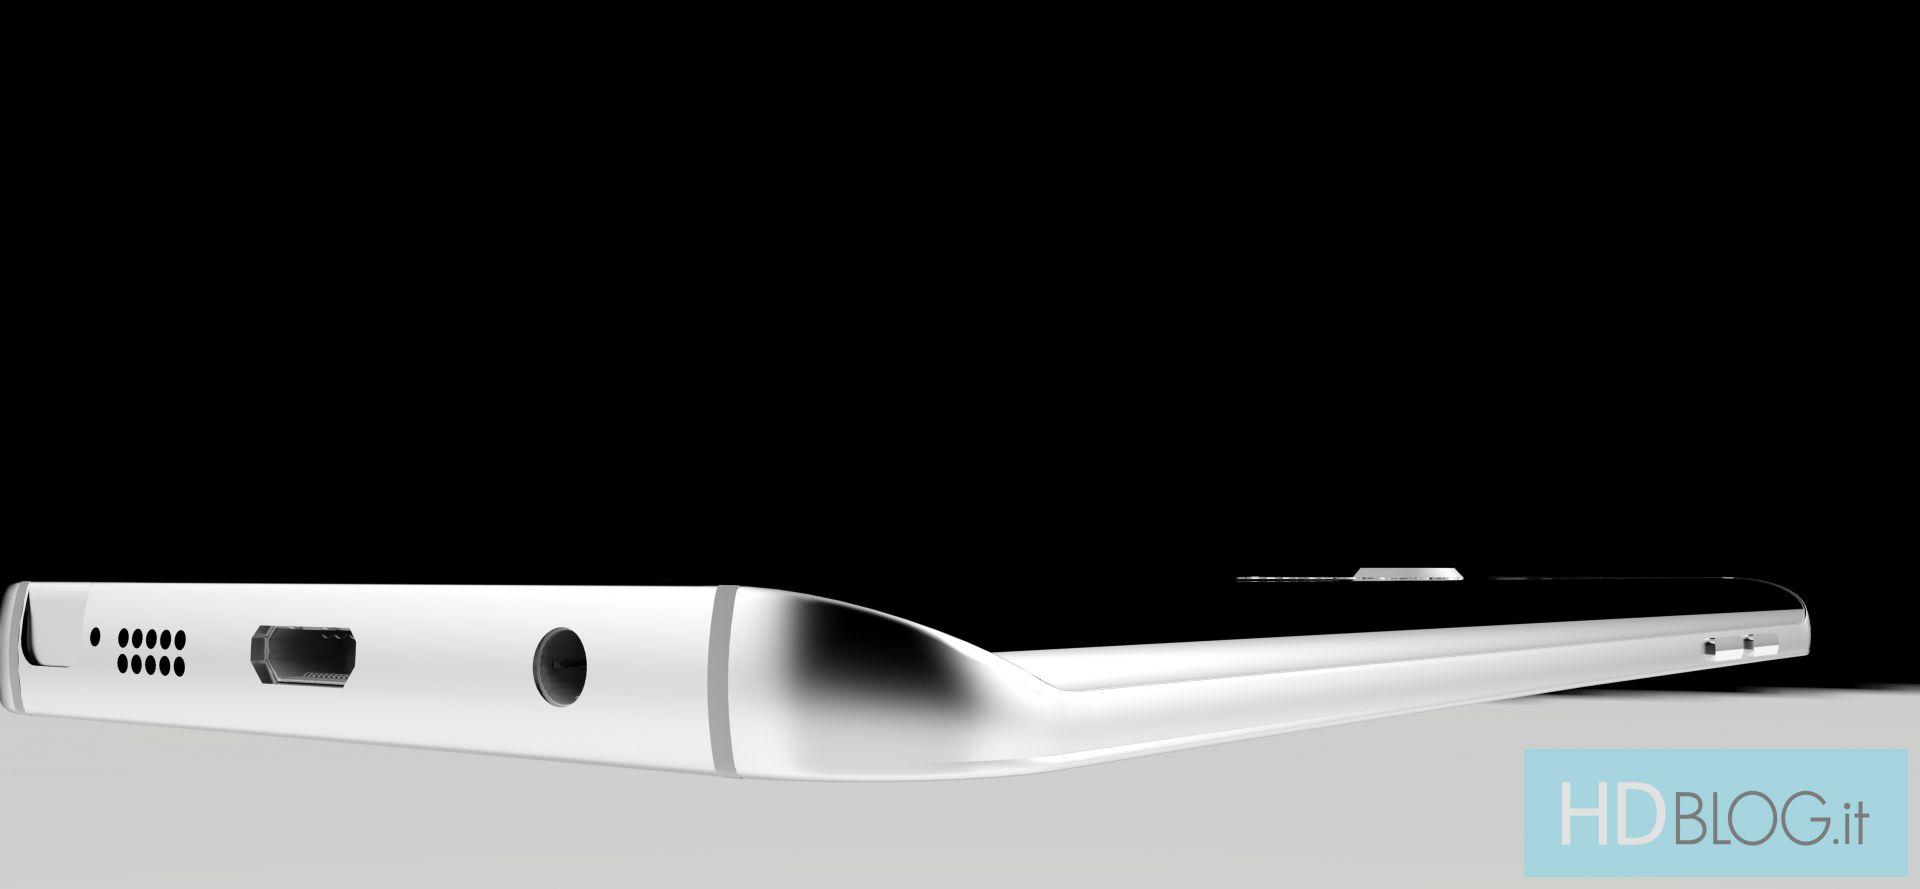 Galaxy-Note-5-schematics-and-concept-renders-18.jpg